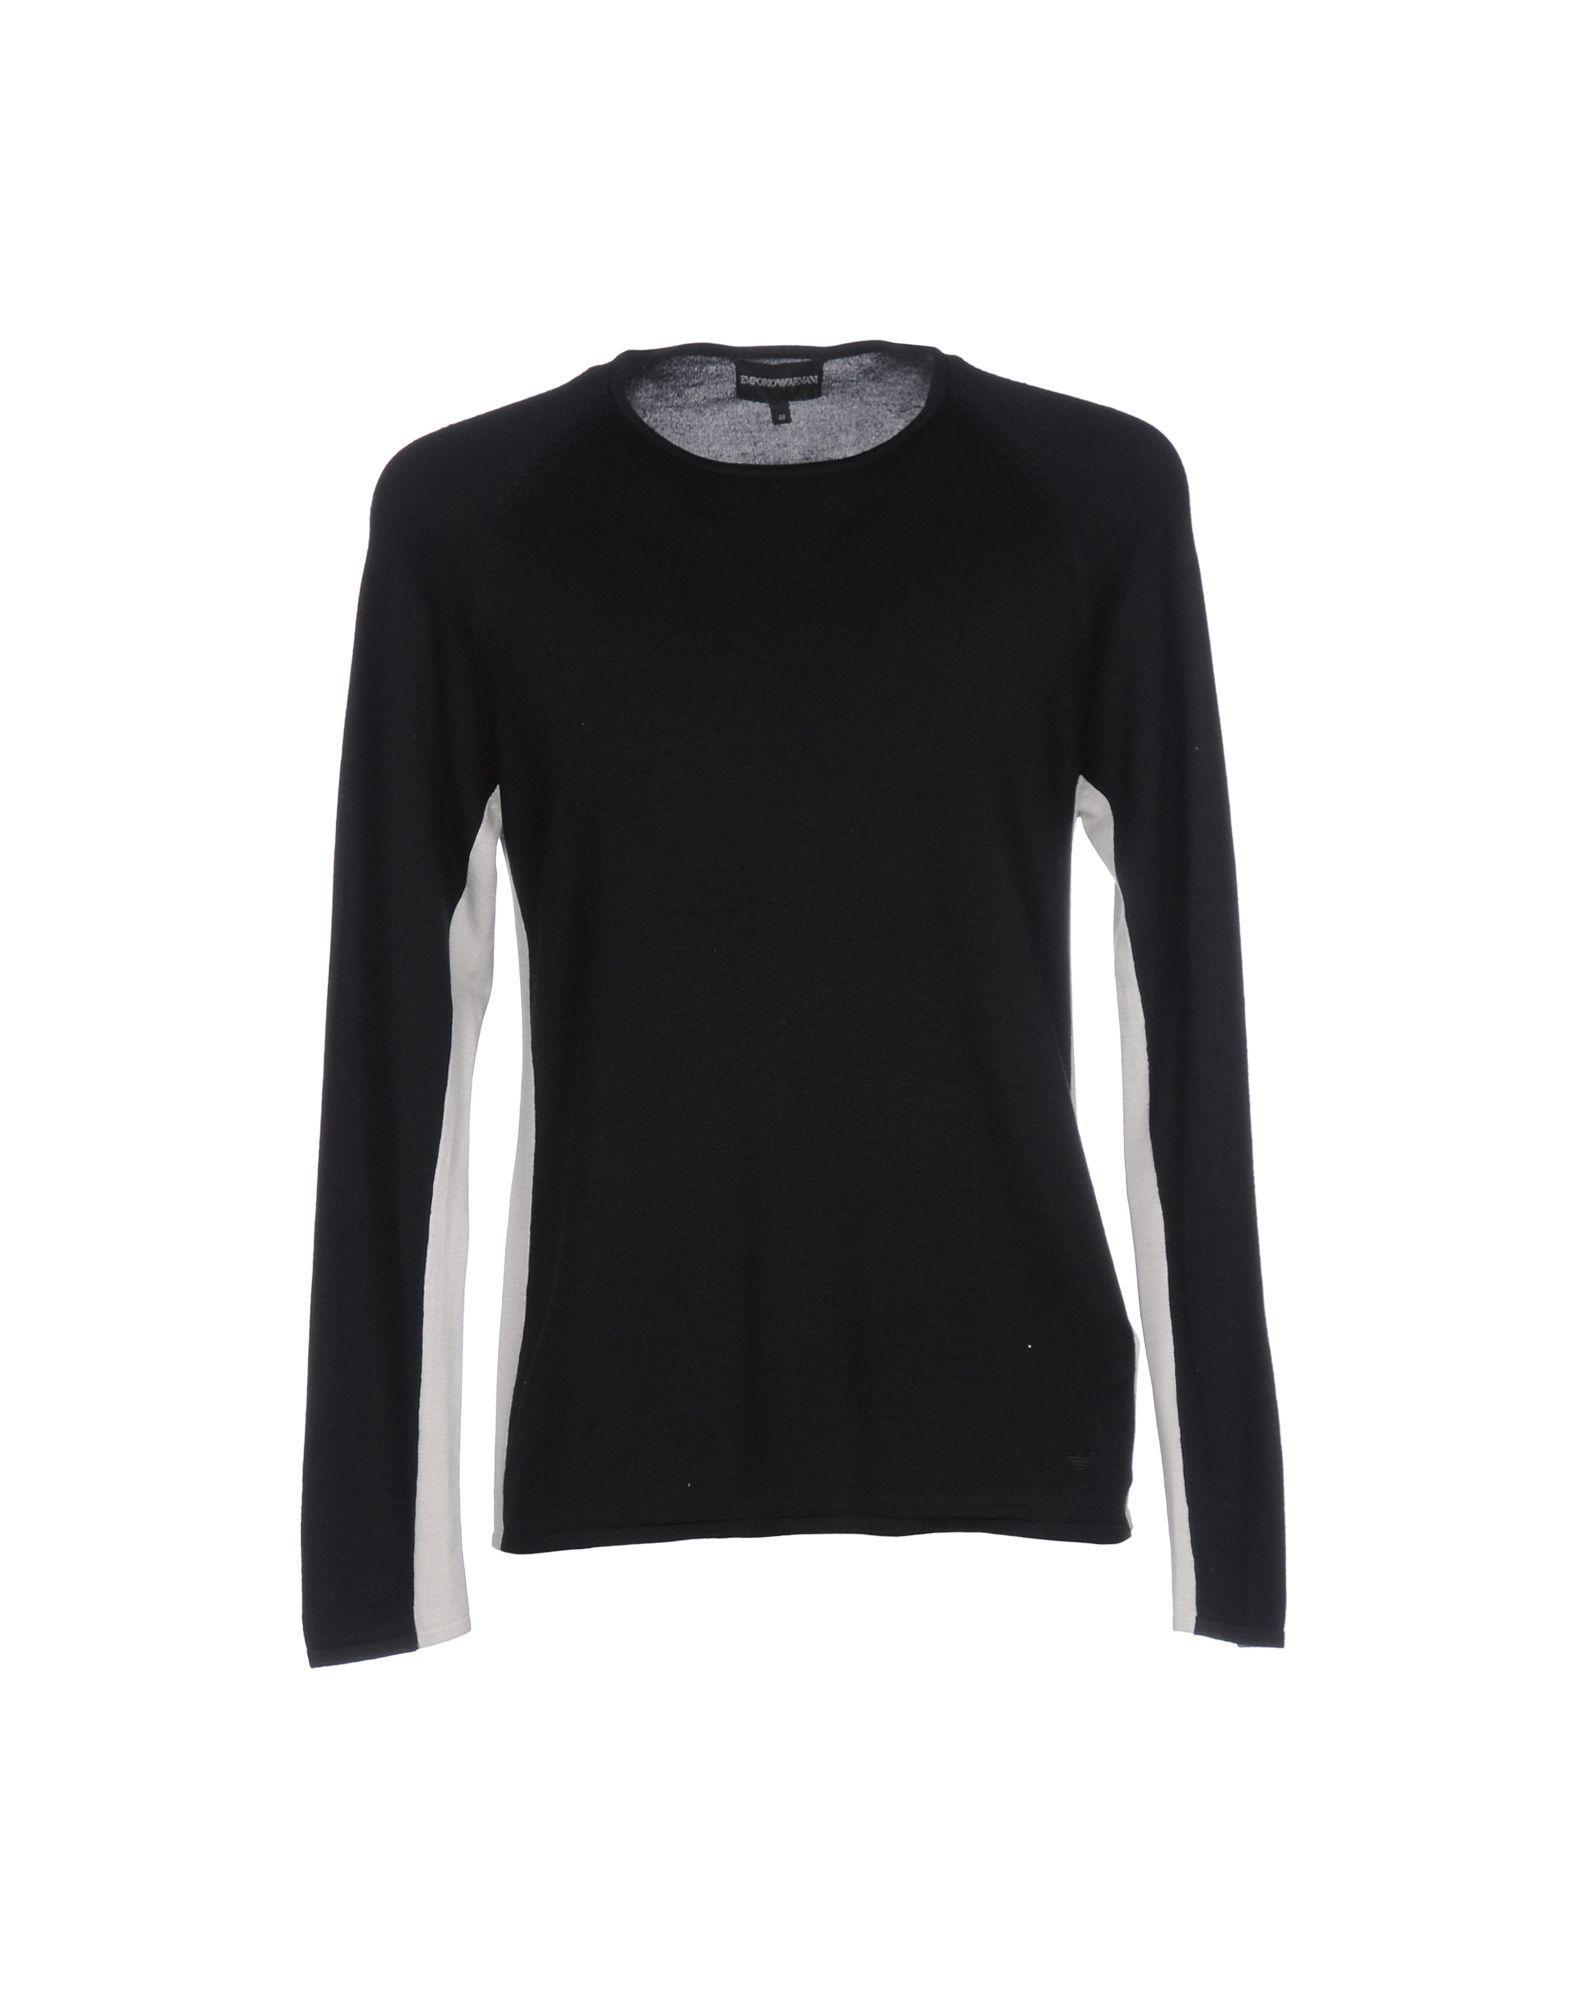 emporio armani sweater in black for men lyst. Black Bedroom Furniture Sets. Home Design Ideas